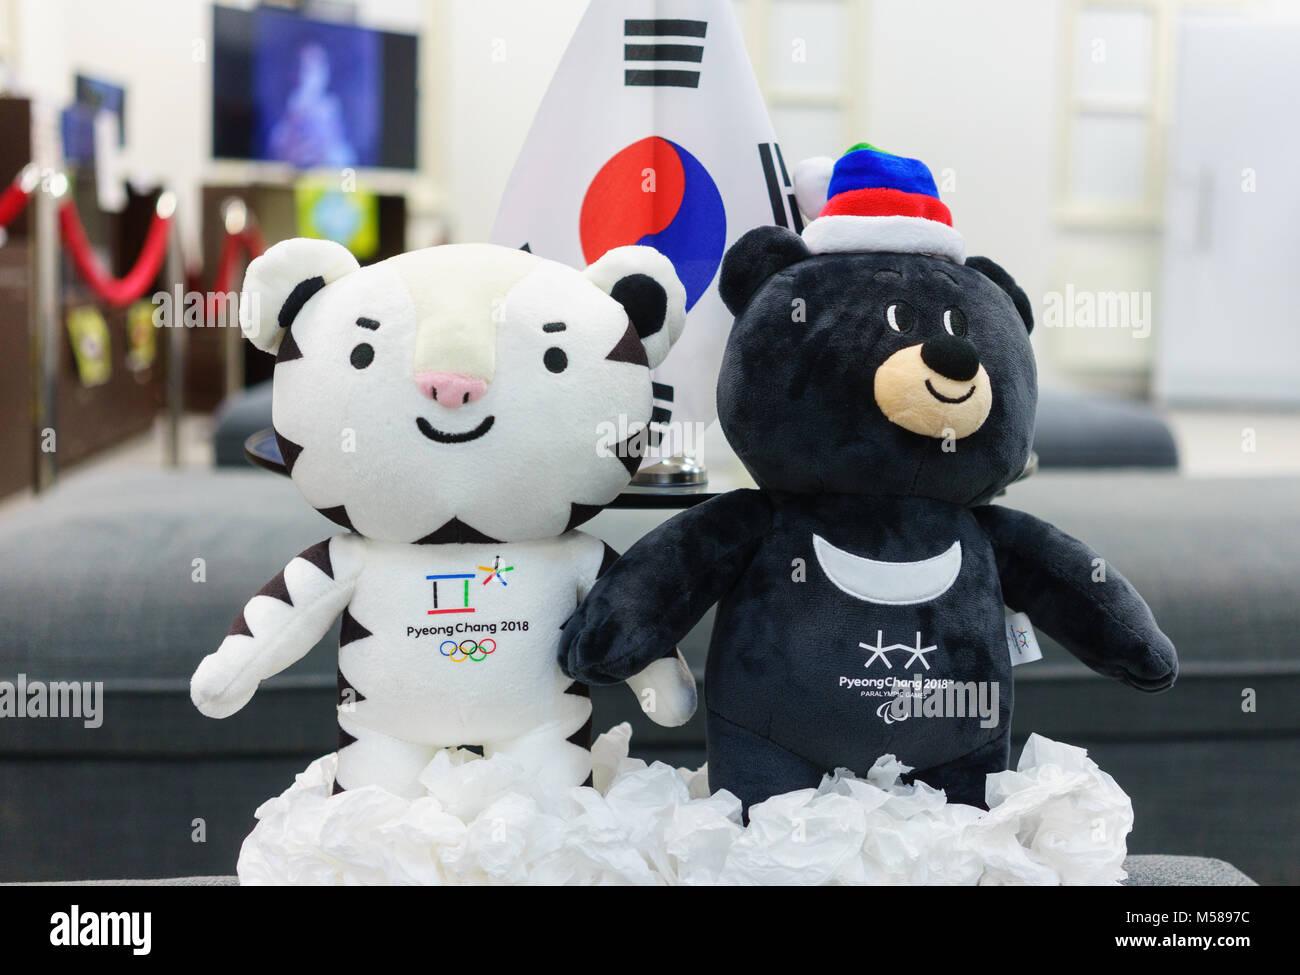 Diciembre 22 2017 Moscu Rusia Mascotas Oficiales Xxiii Juegos